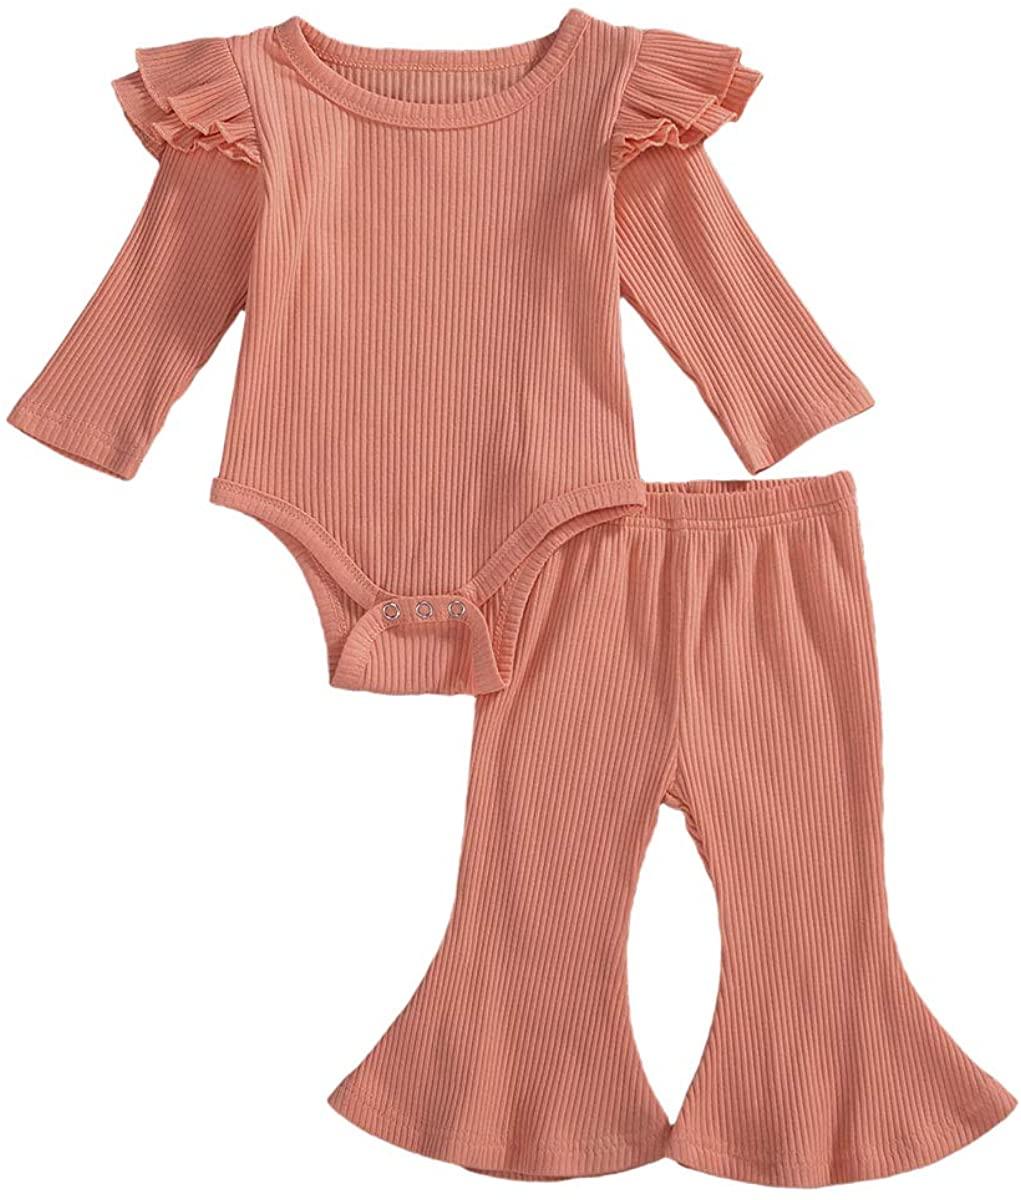 Newborn Baby Girls Knit Suits Long Sleeve Ruffle Romper Bell-Bottom Long Pants 2PCS Clothes Set